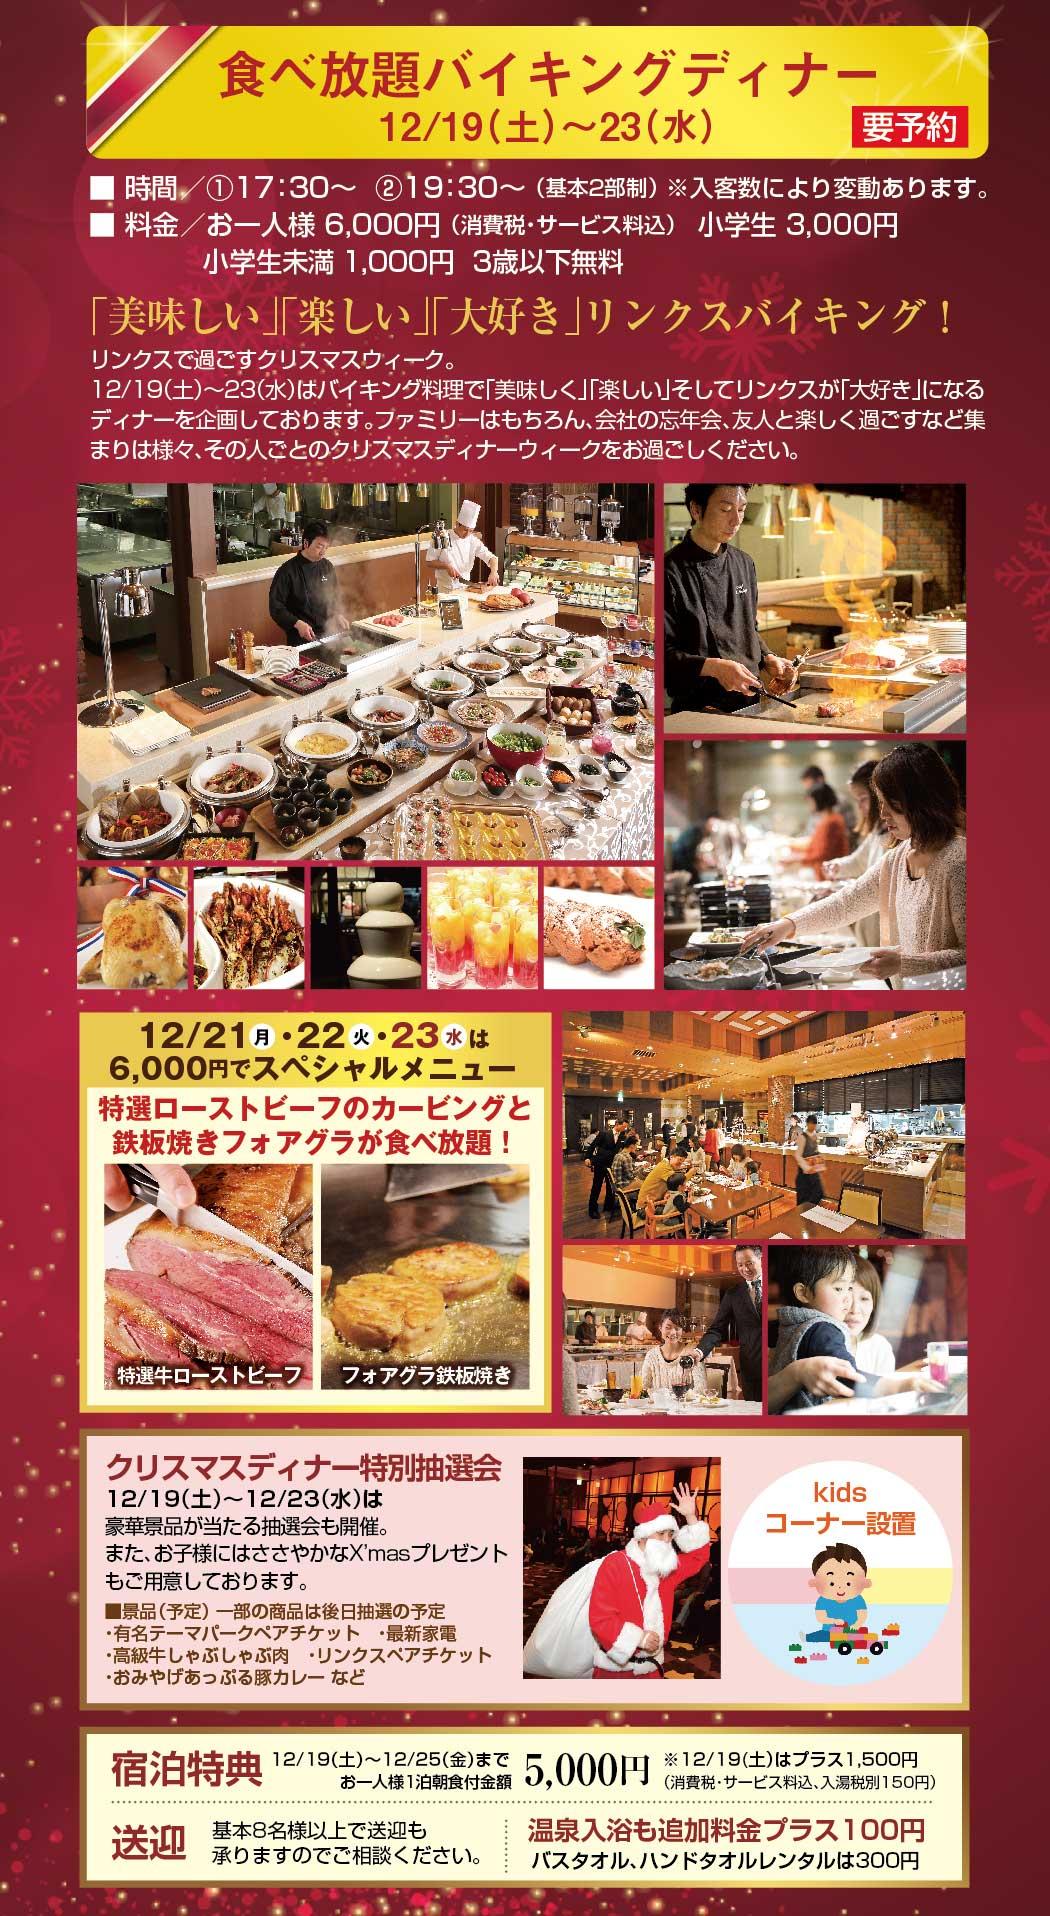 http://www.komagane-linx.co.jp/blogimages/kamiina201512-02.jpg